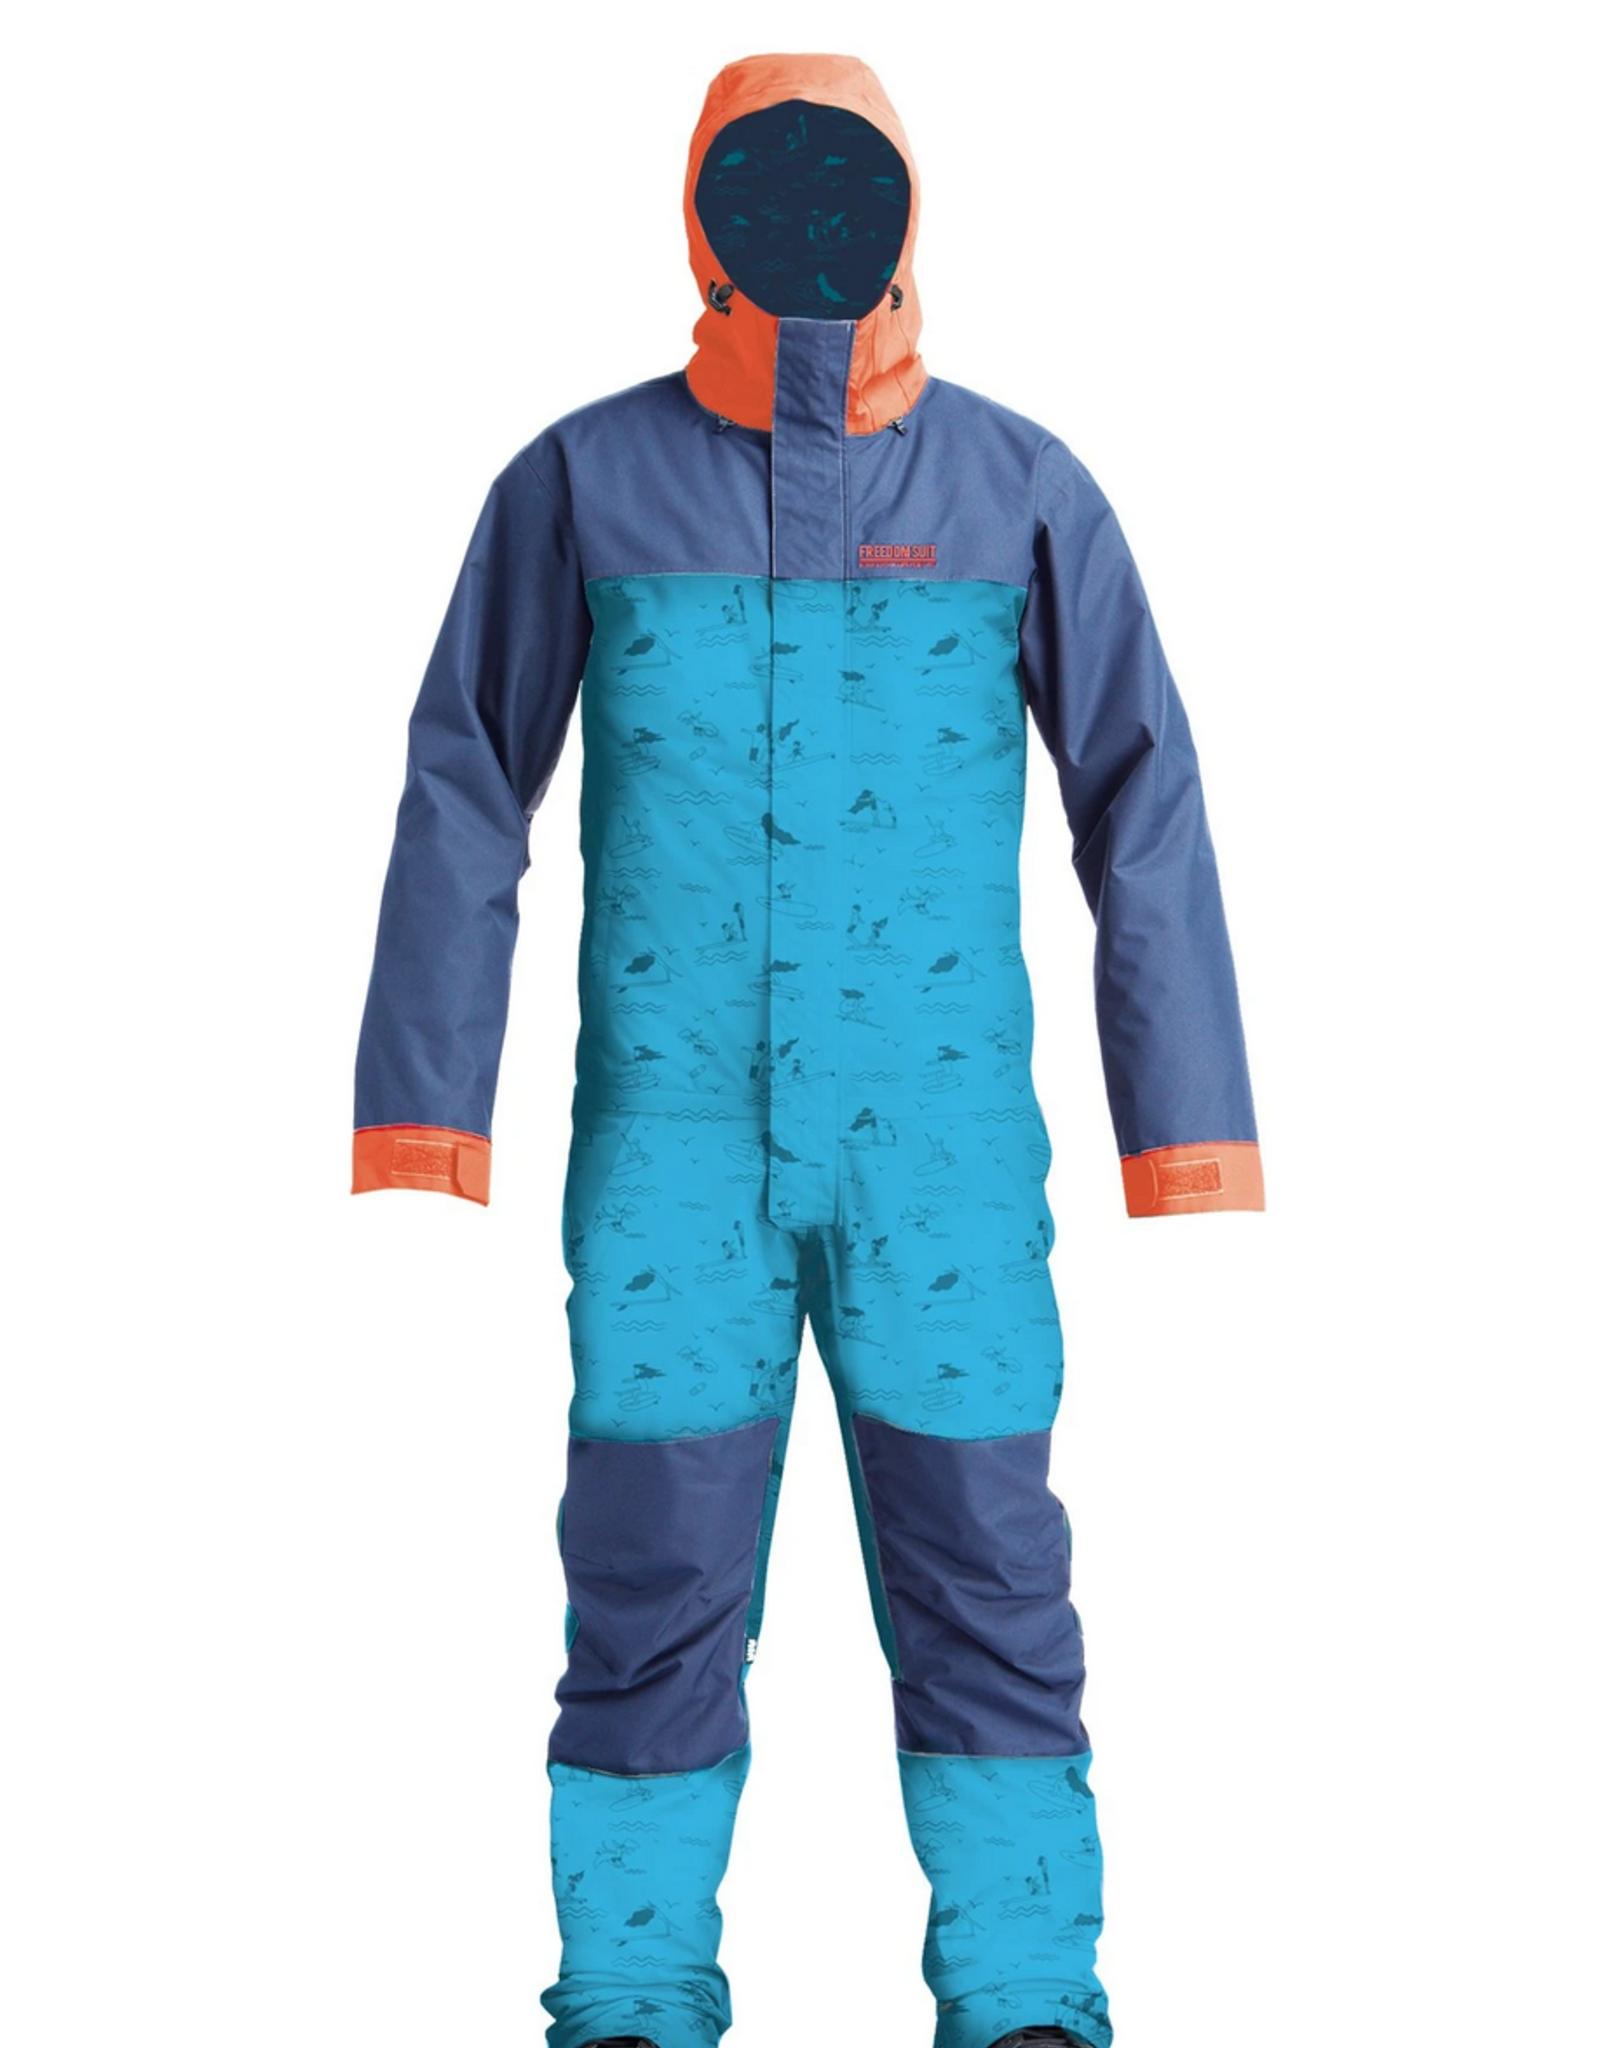 Airblaster Airblaster Stretch Freedom Suit